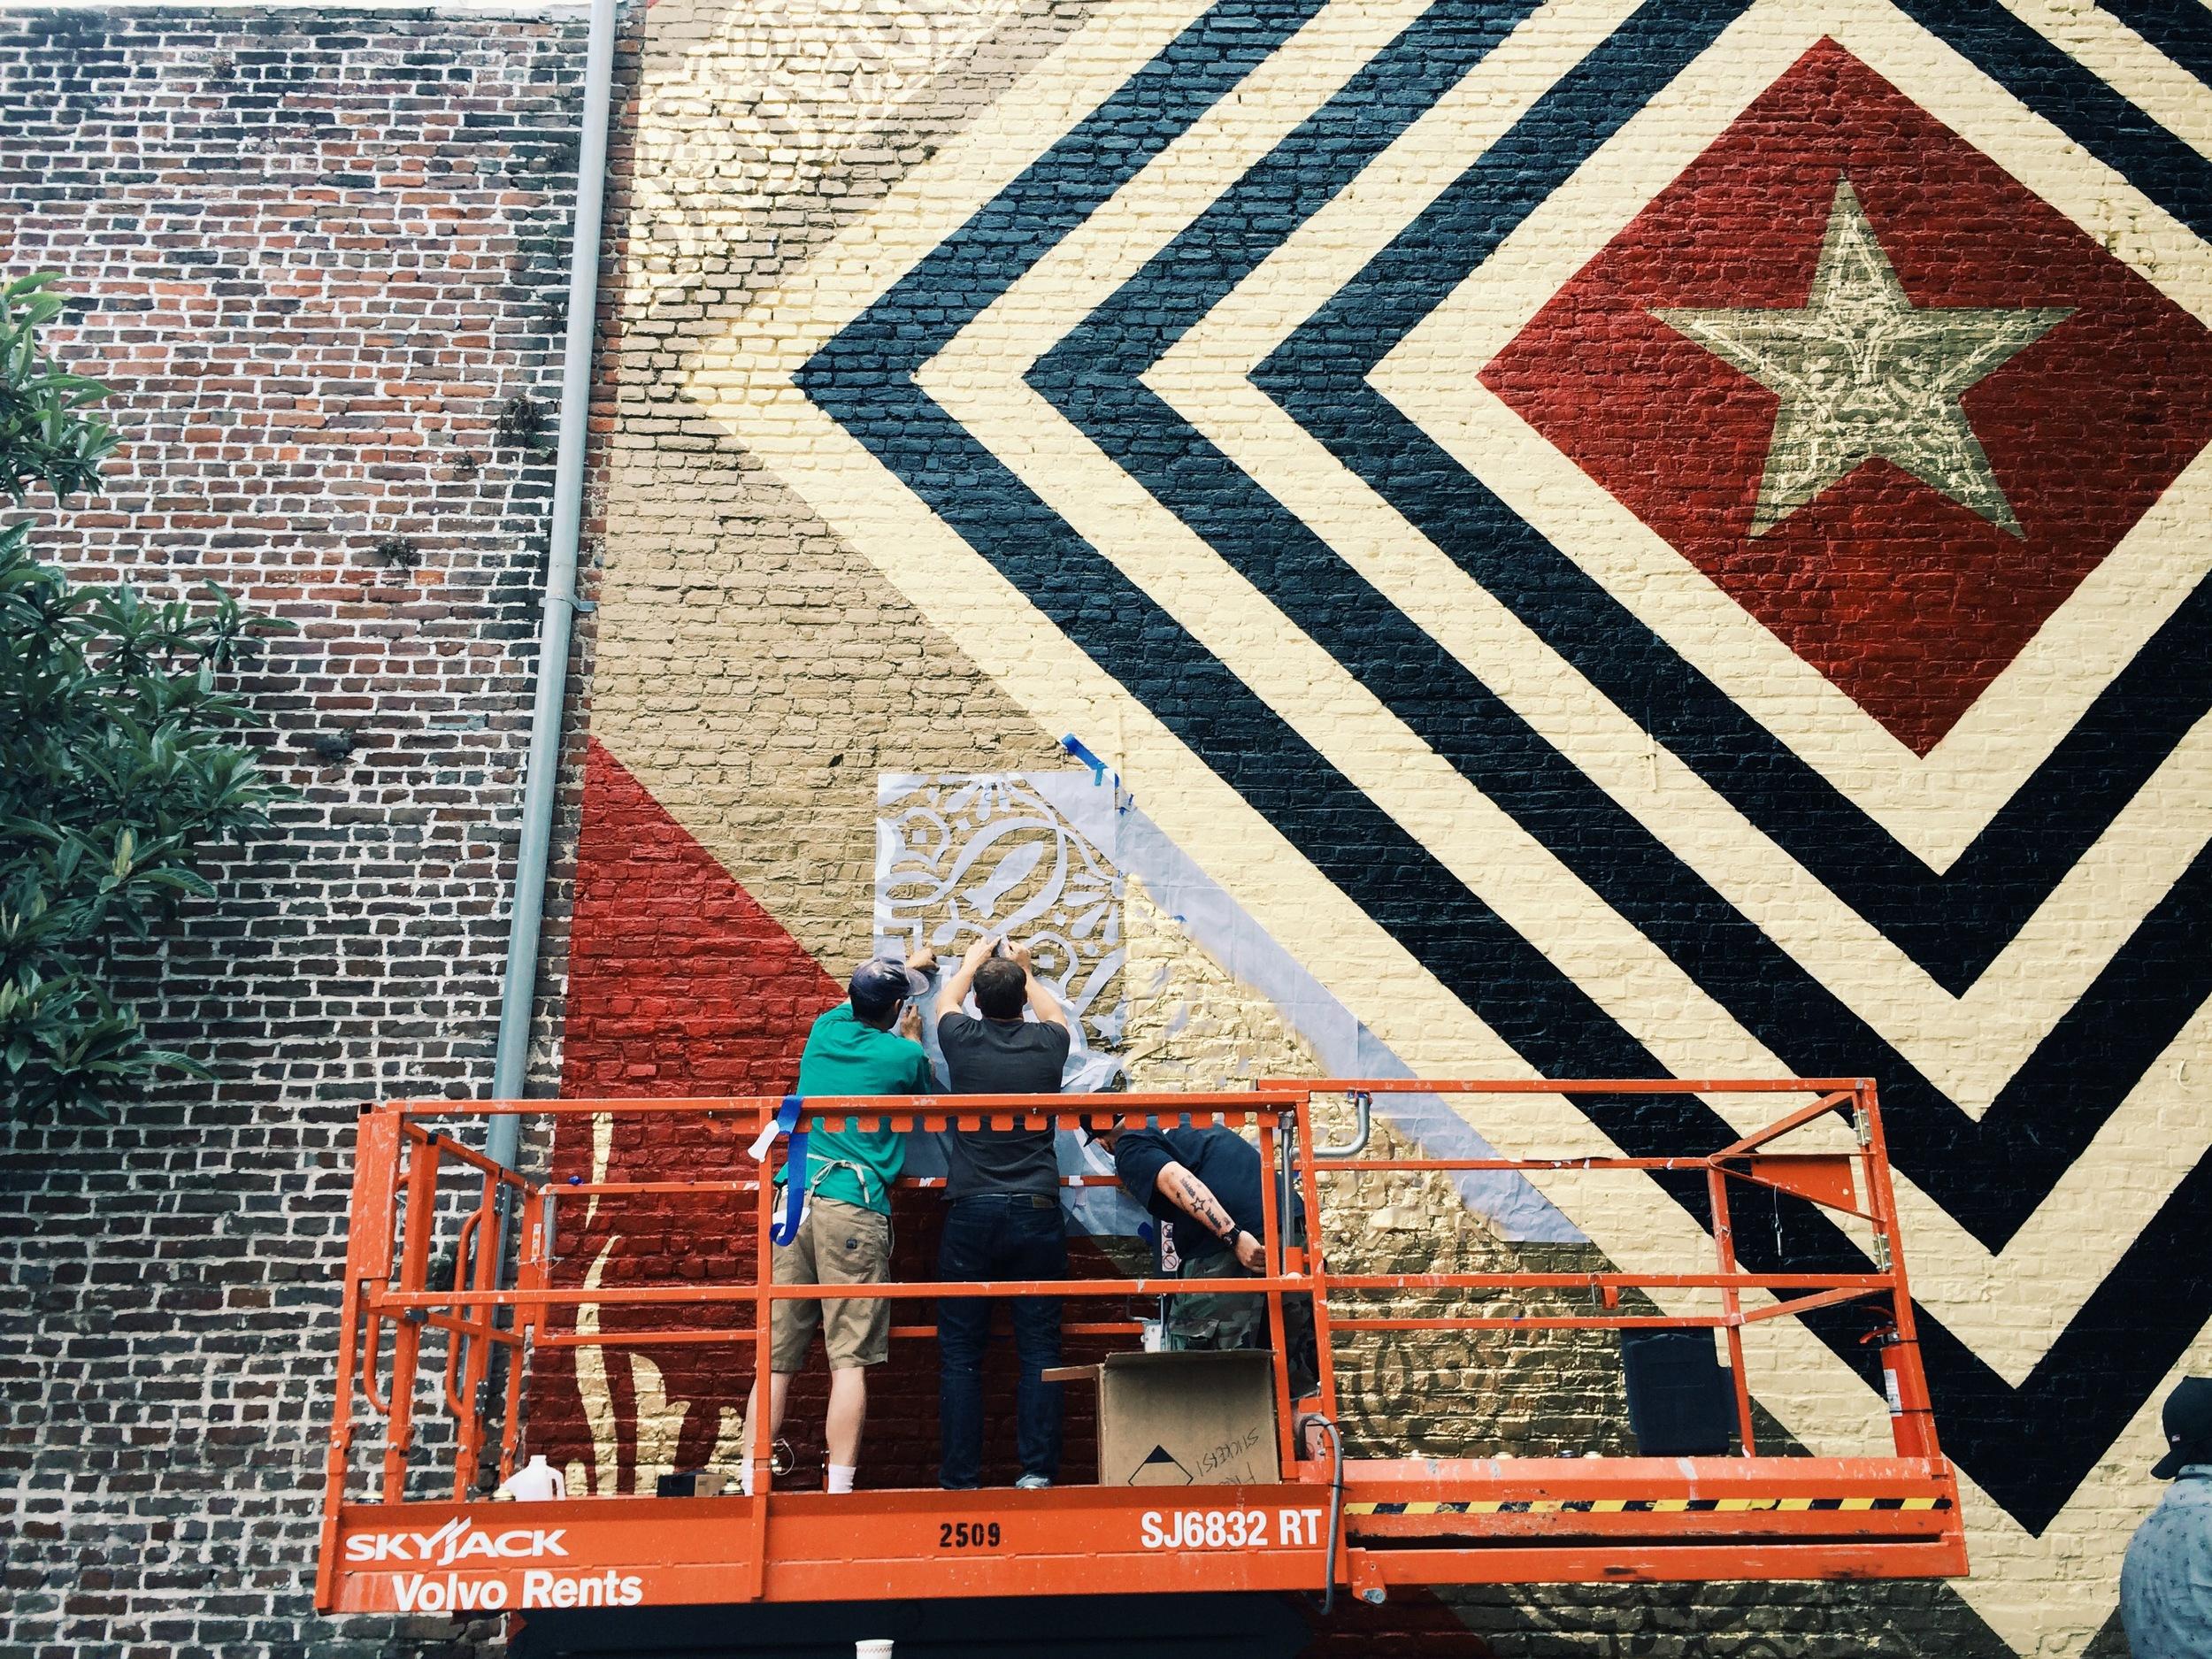 Shepard Fairey stenciling in detail on King Street